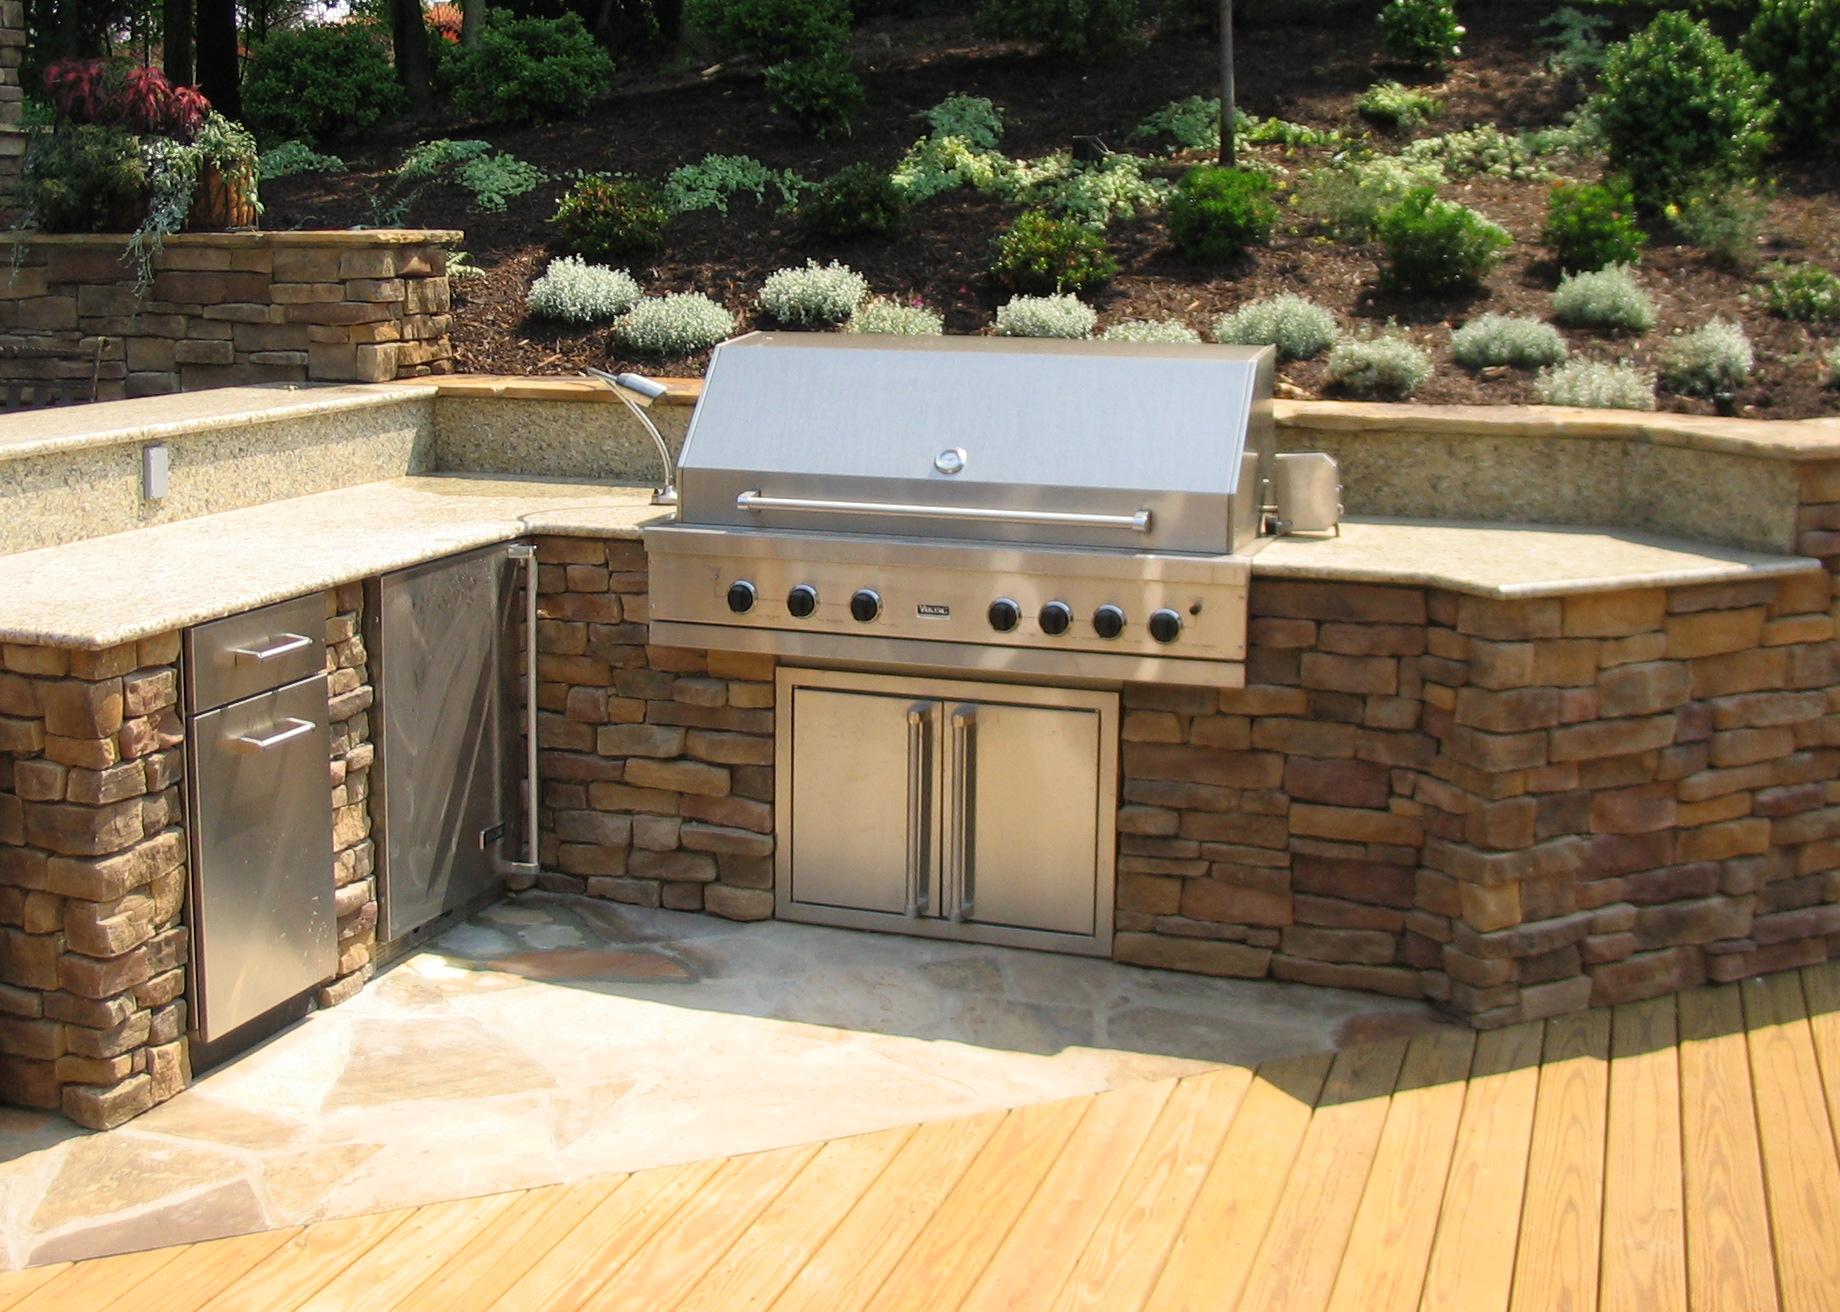 Designing an Outdoor Kitchen - Revolutionary Gardens on Exterior Grill Design id=19920